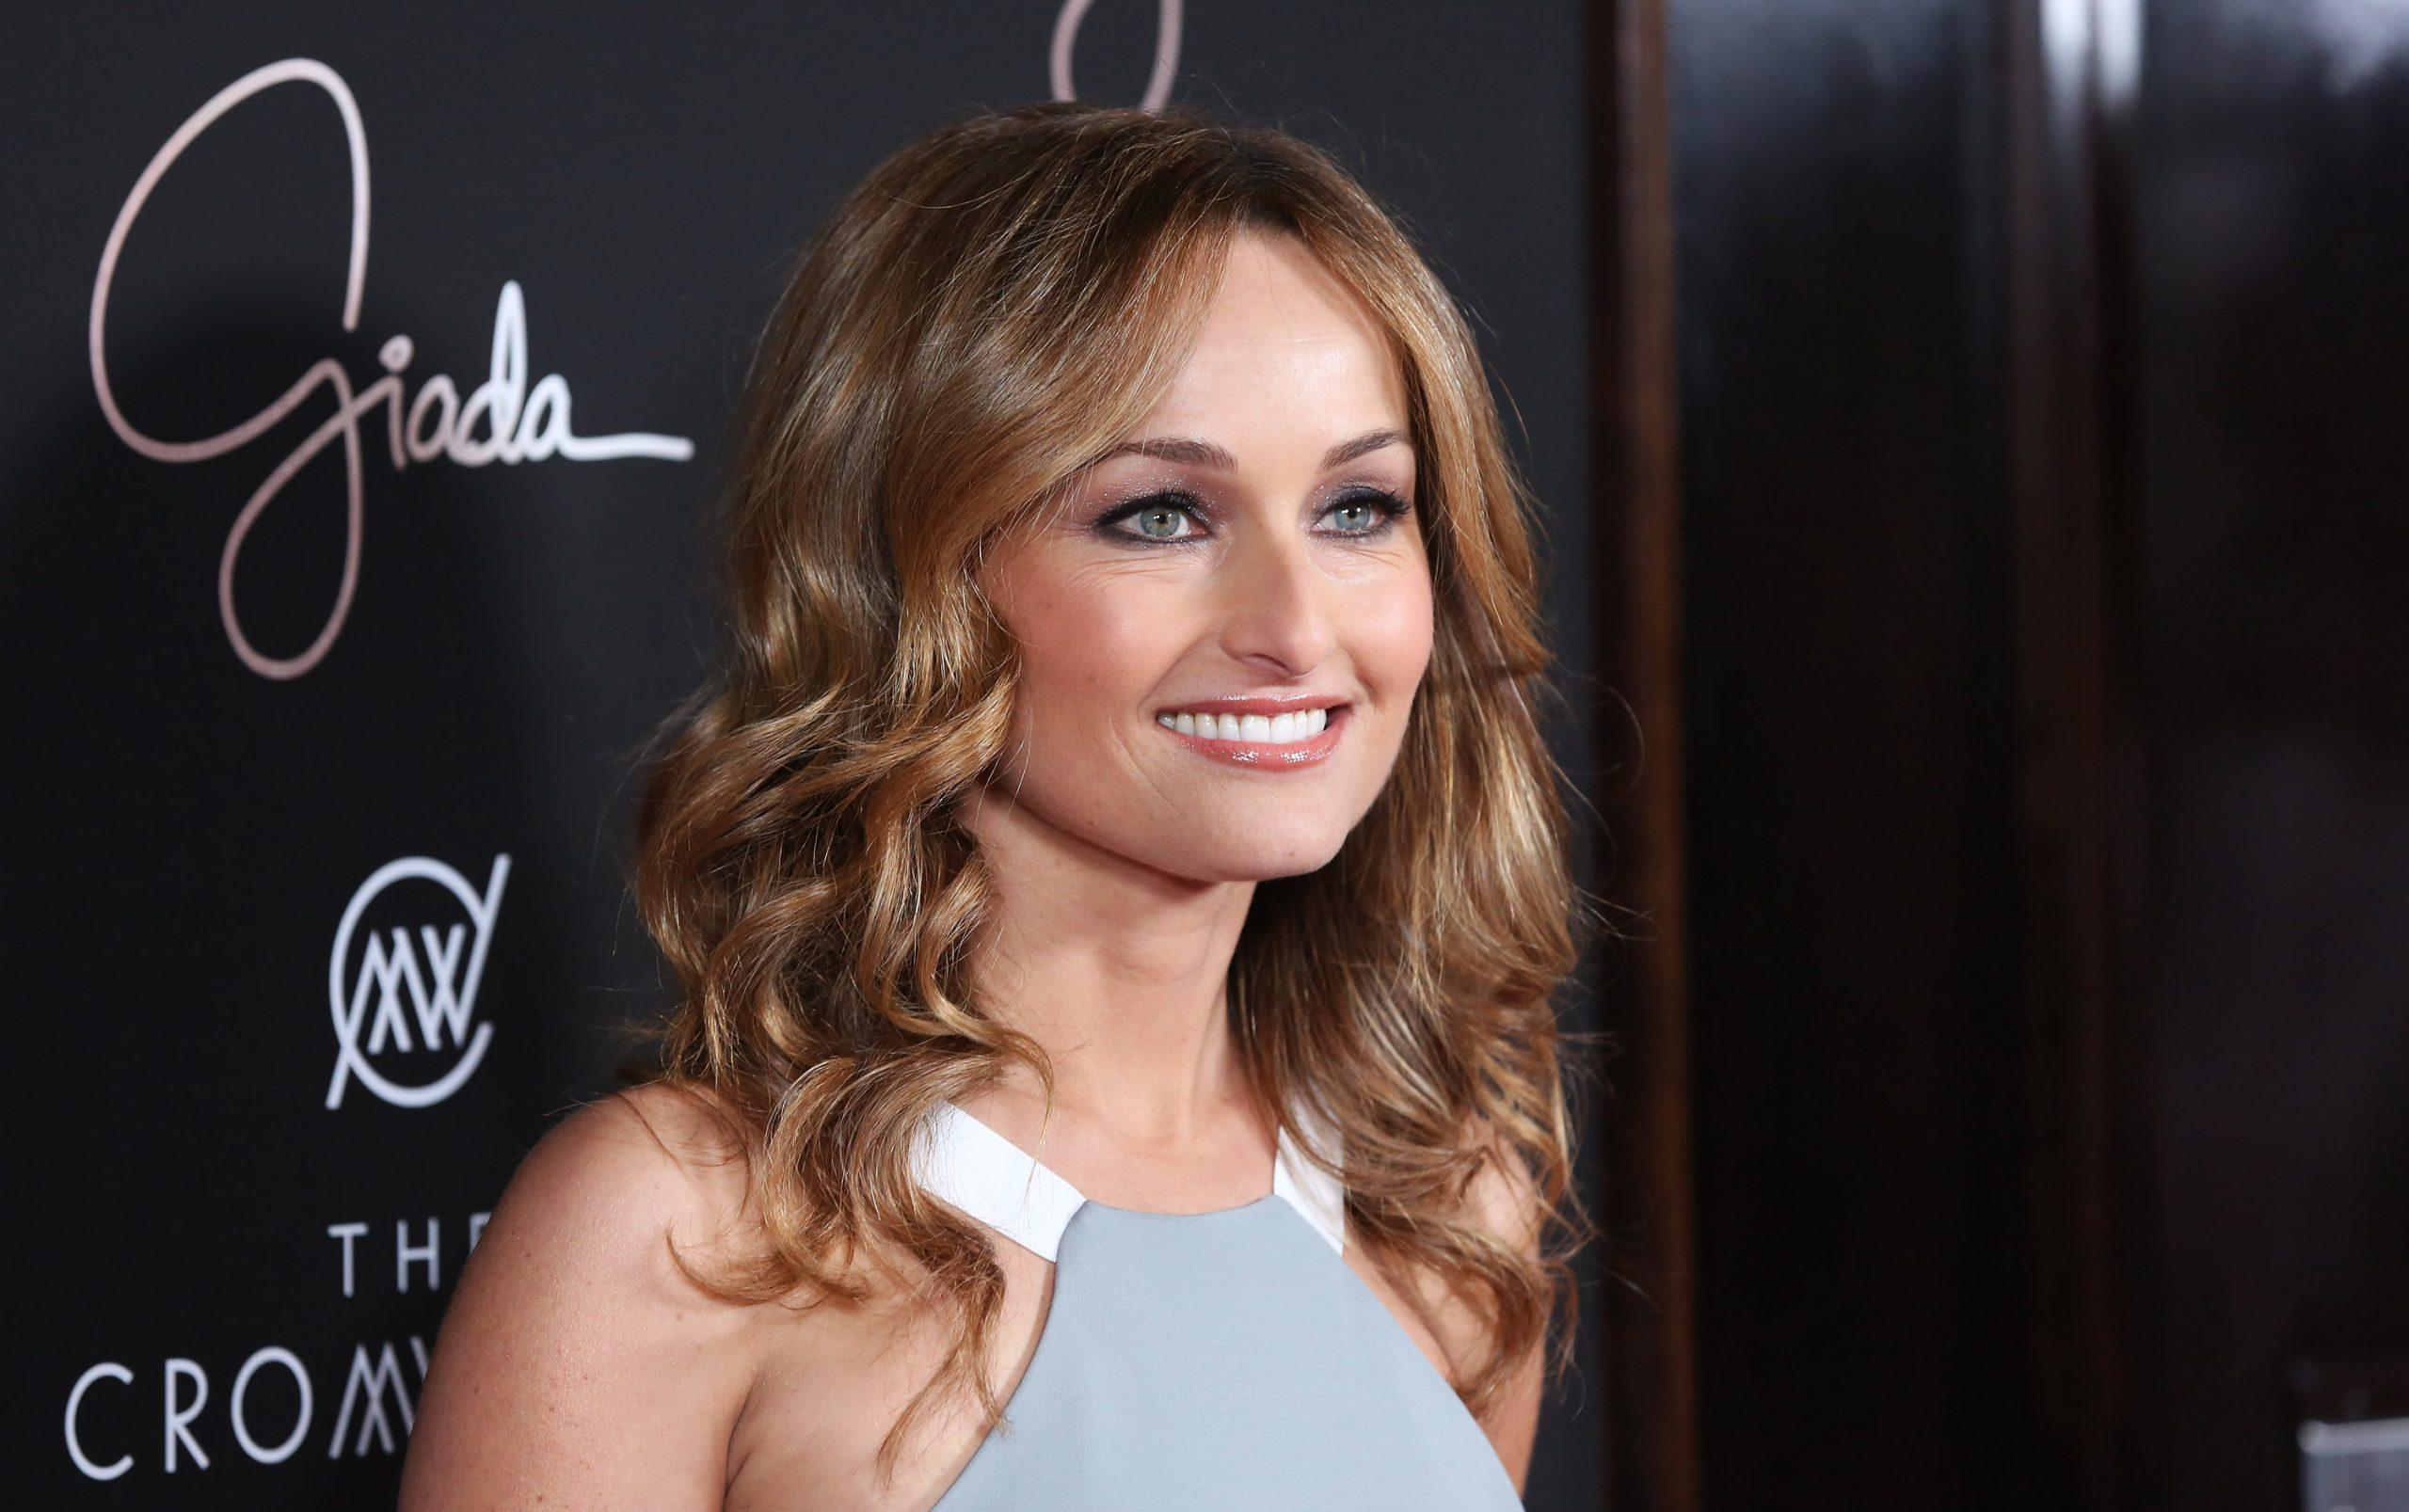 Food Network star Giada De Laurentiis smiles as she wears a sleeveless gray dress at a 2014 restaurant opening.